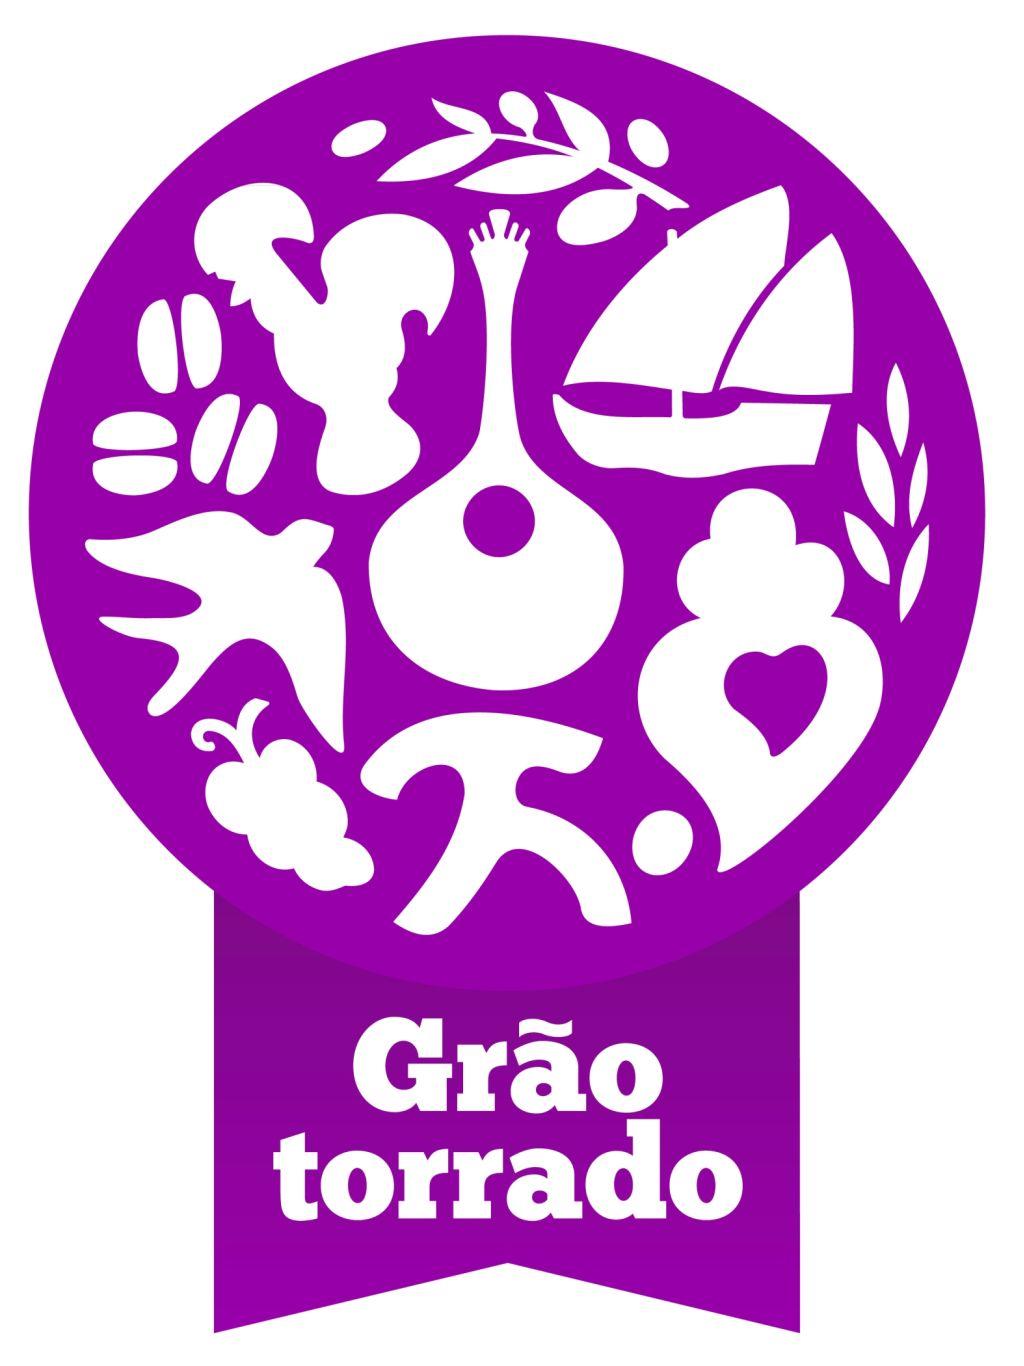 grao_torrado